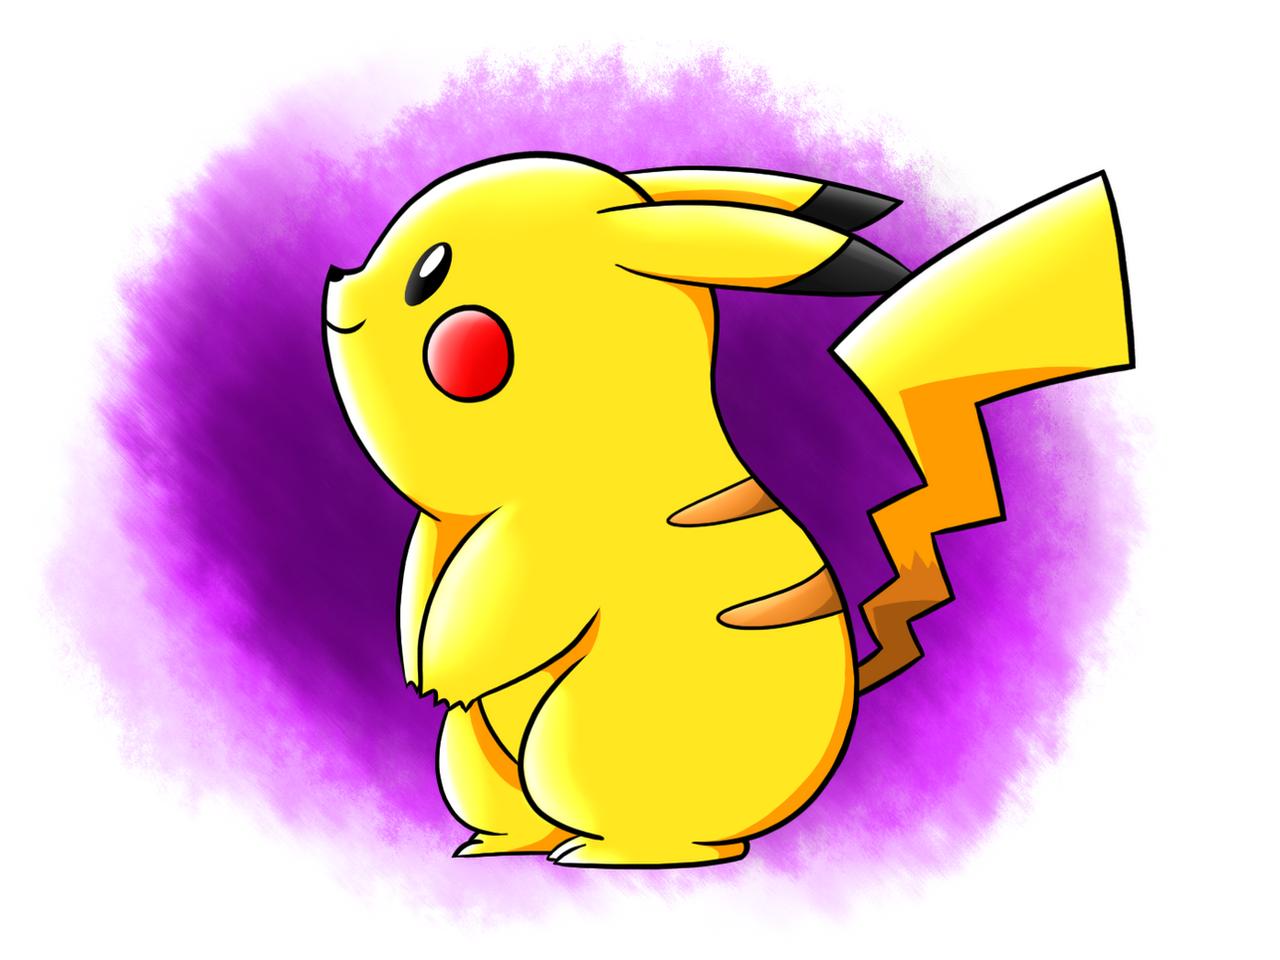 Pikachu! by cromarlimo